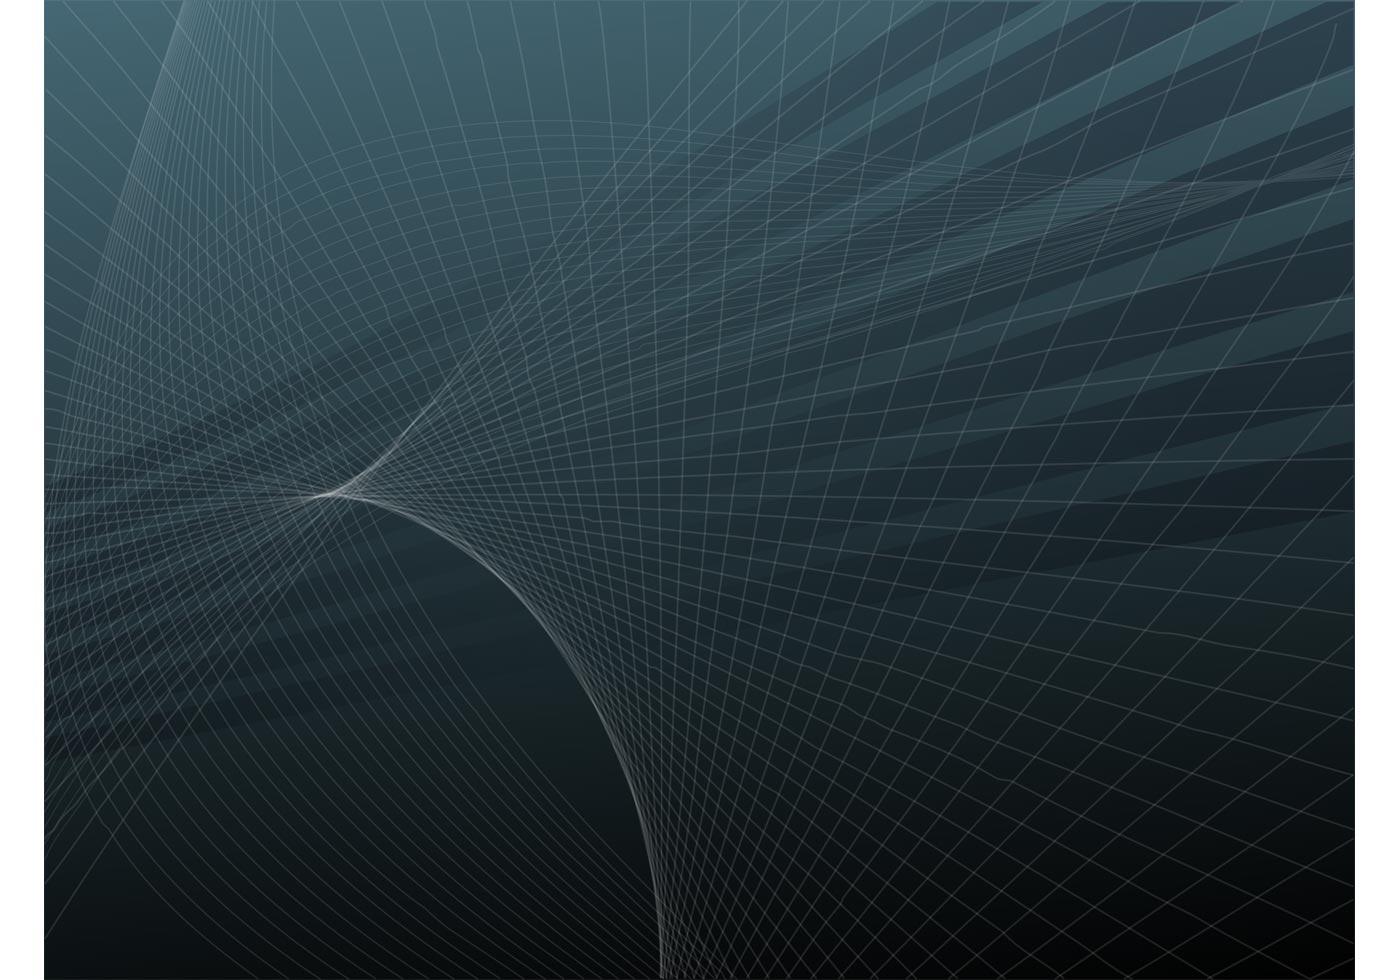 Lines Background - Download Free Vector Art, Stock ...